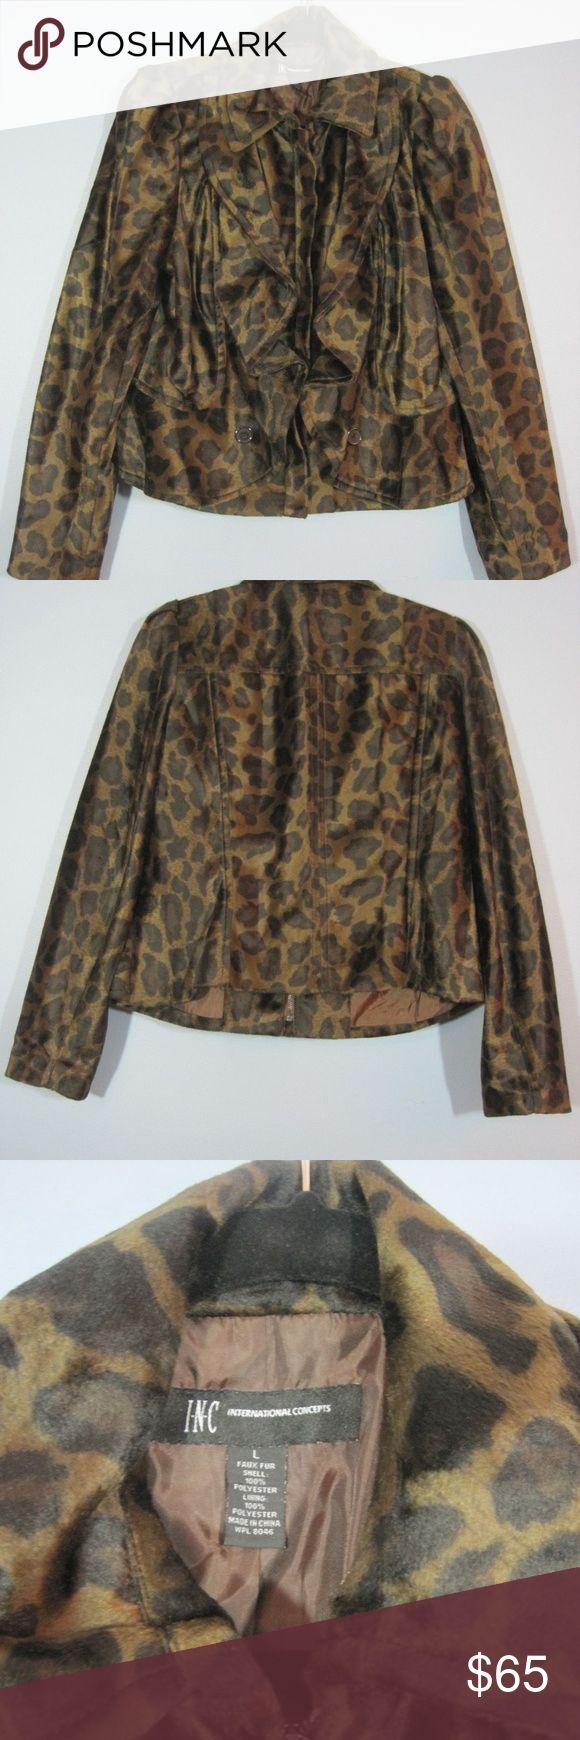 "Animal Print Leopard Ruffled Jacket Coat- Sz L Women's International Concepts Animal Print Leopard Ruffled Jacket Coat- Sz L  Good overall used condition. No pockets. Zipper front closure. Ruffled front design.  Measures approximately:   Length: 25""  Sleeve: 26""  Chest: 40""  Waist: 38""  Hips: 42"" International Concepts Jackets & Coats"